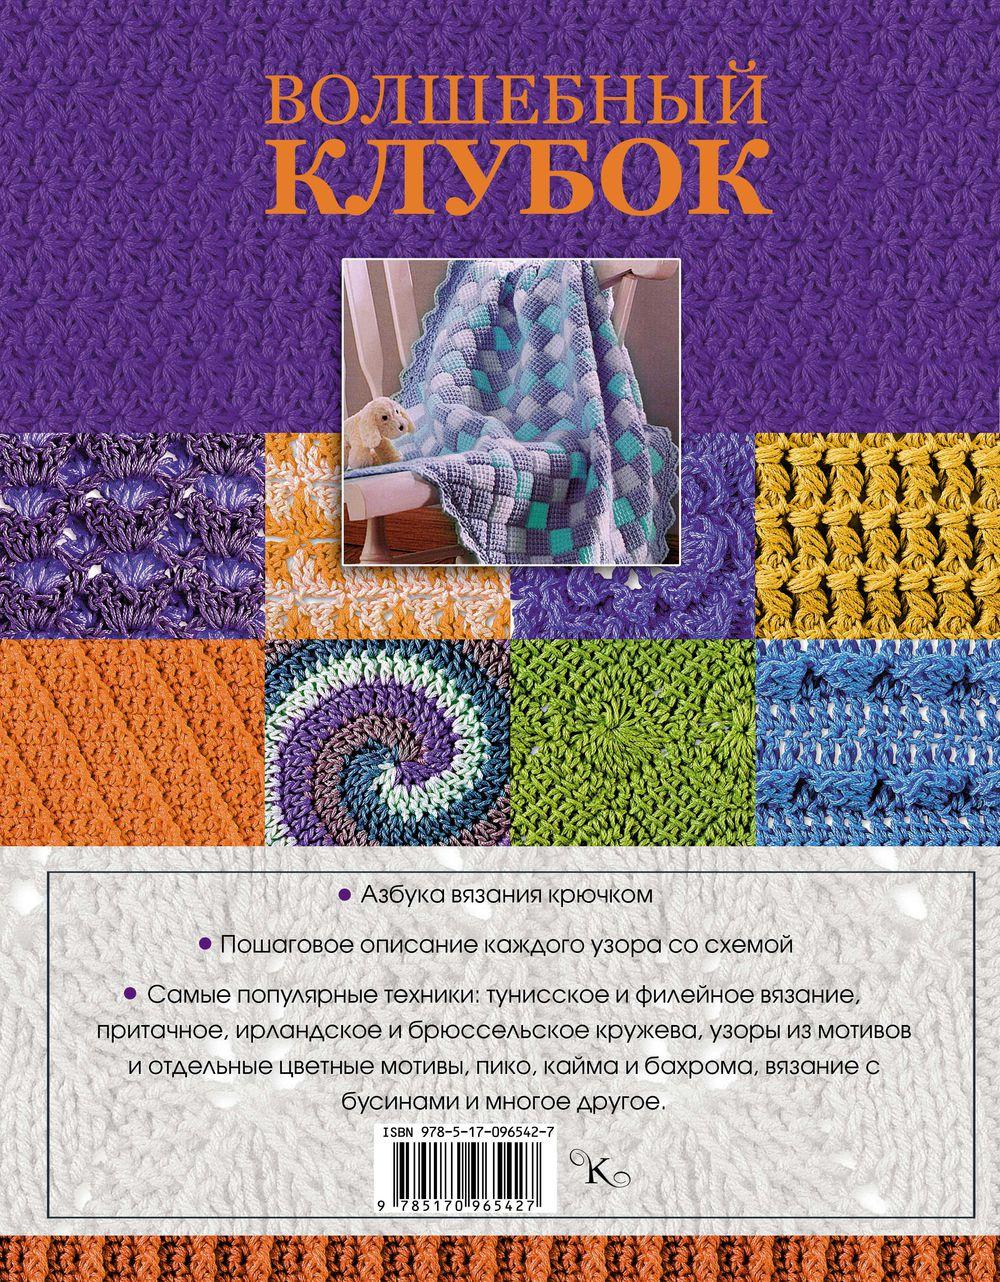 1001 узор для вязания крючком